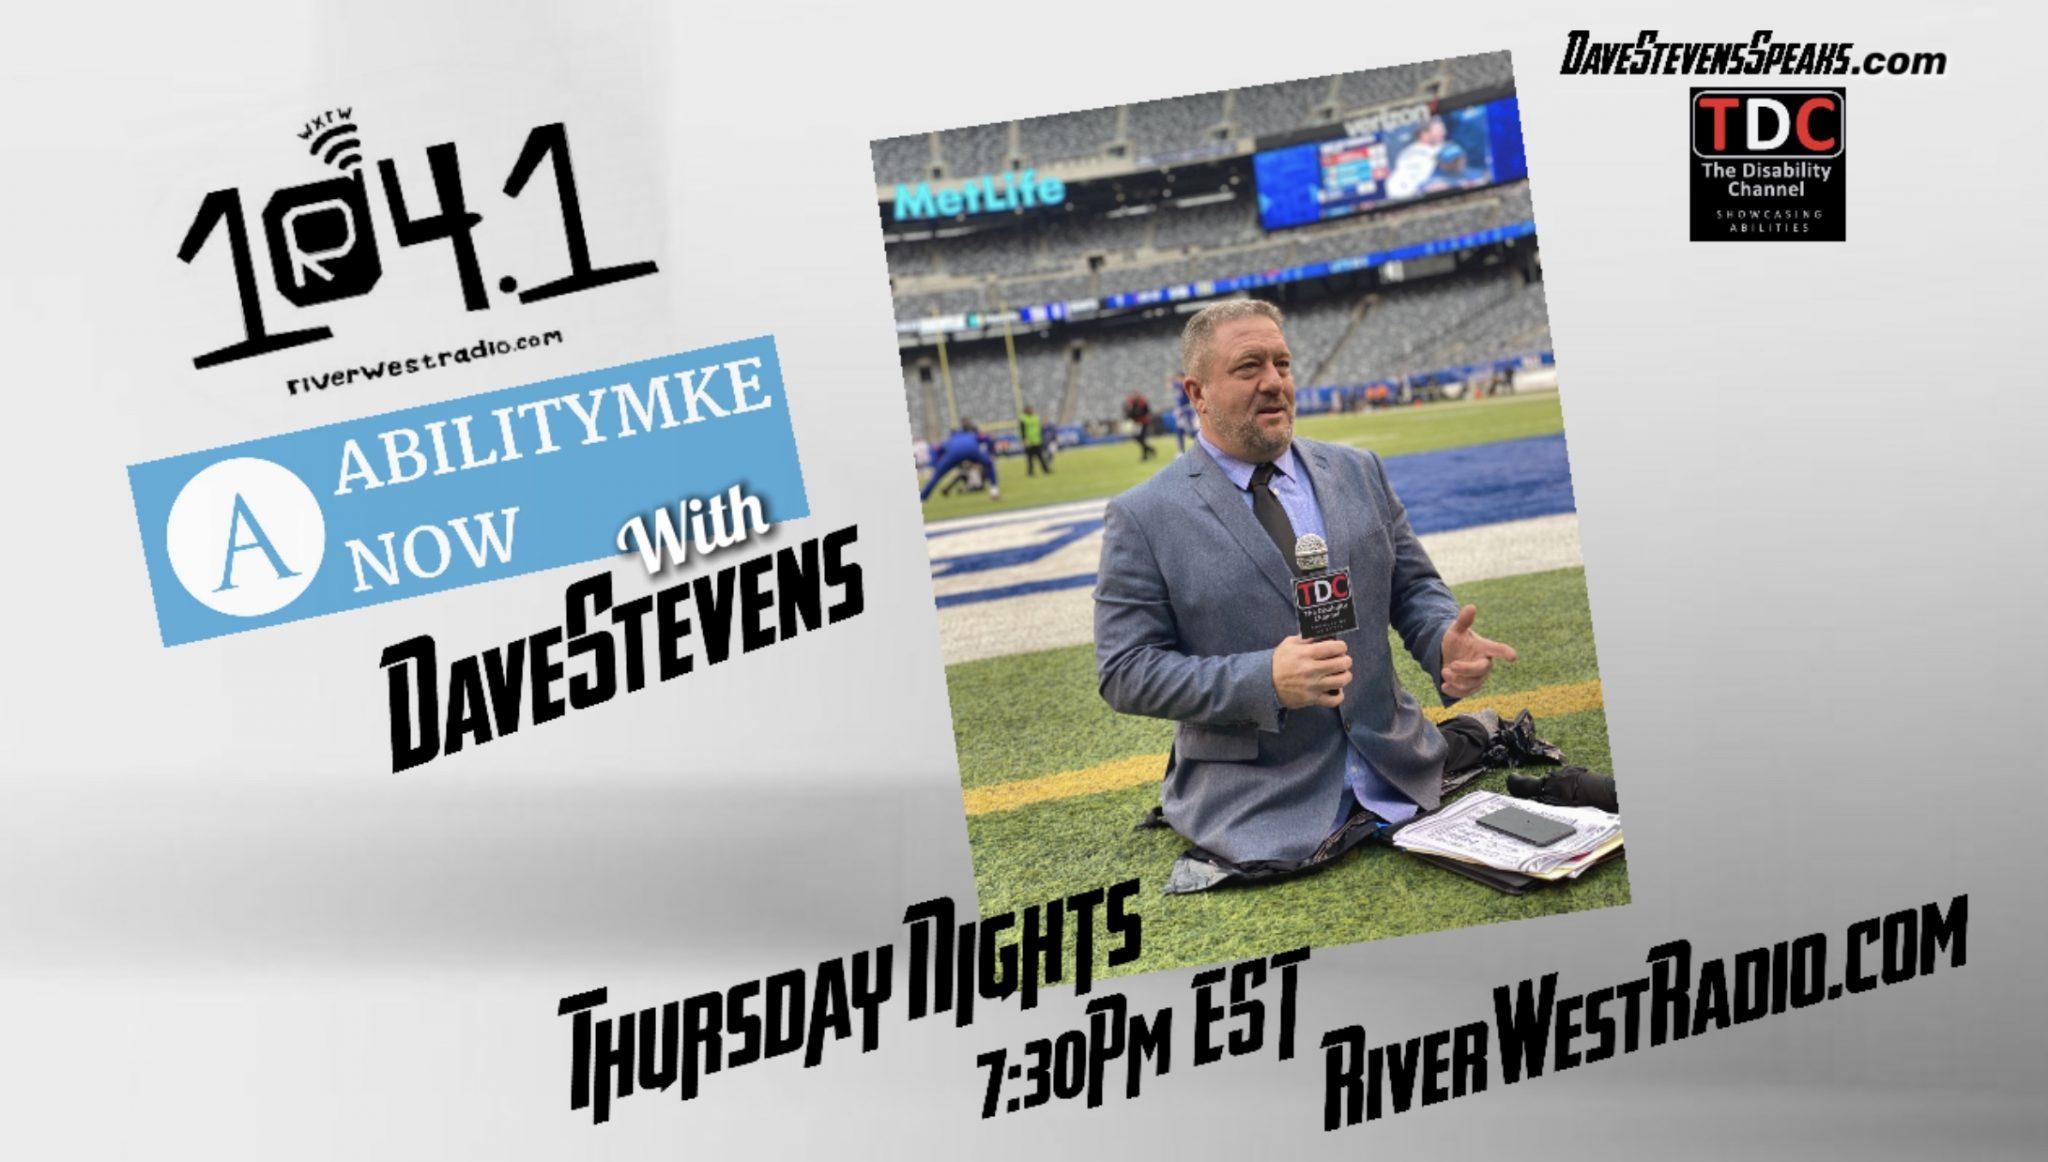 Dave Stevens Thursday nights Milwaukee, Wisconsin